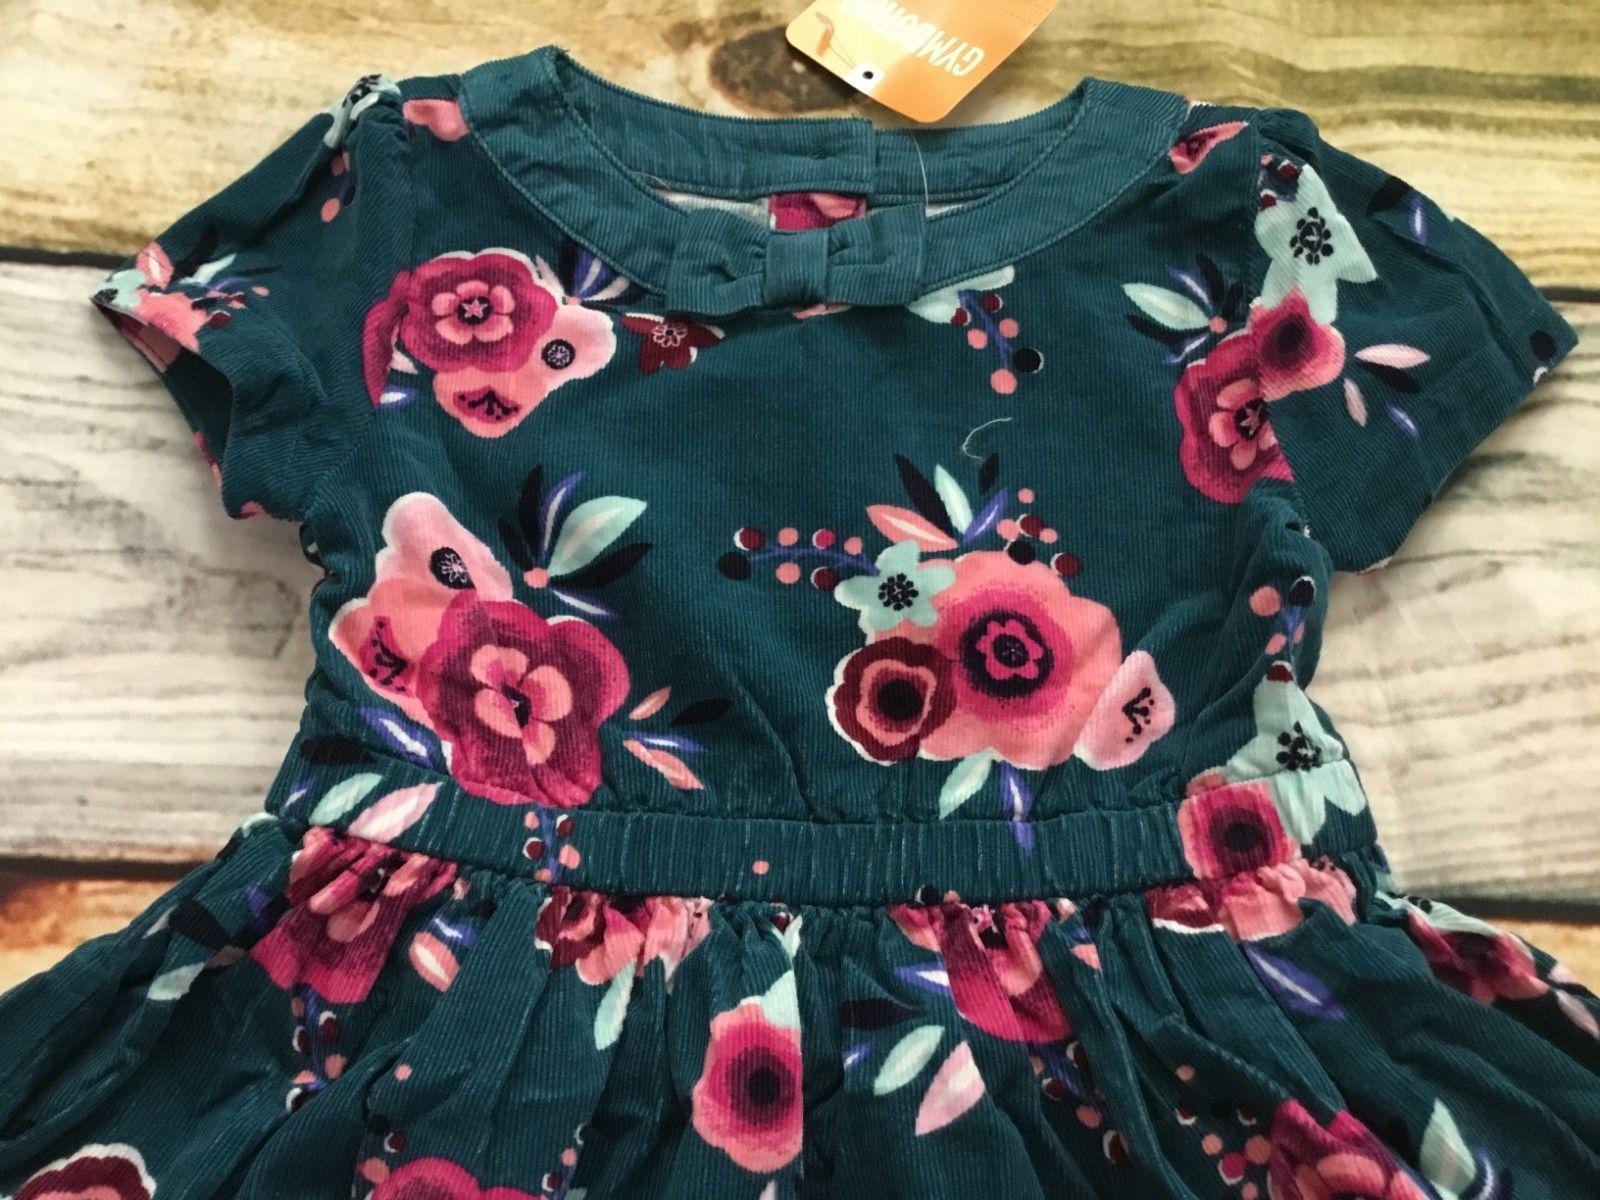 Gymboree Dress 2T Ready Jet Go Floral Corduroy Fall Dress NWT Outlet